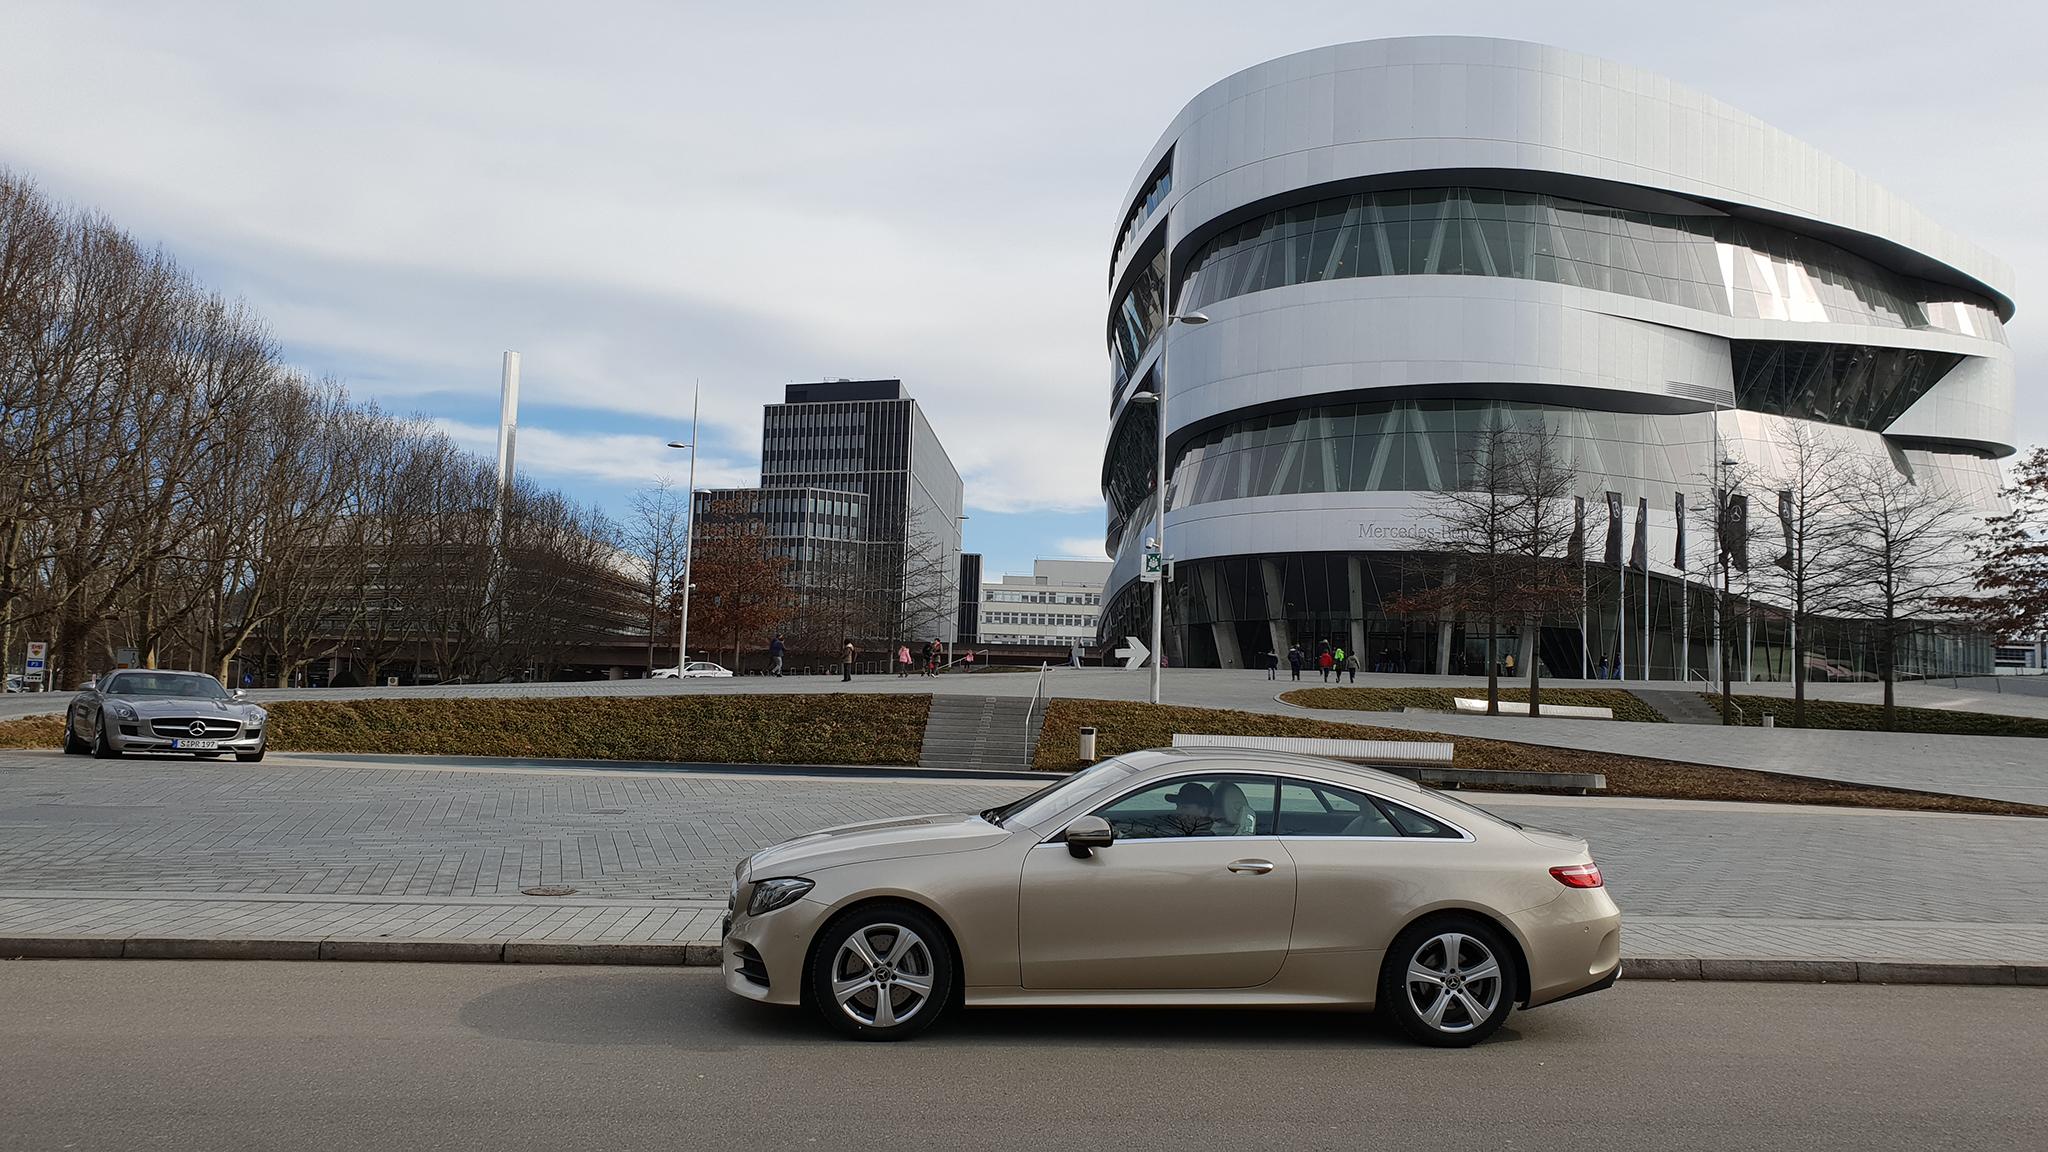 S9-Mercedes-Benz Museum-tinhte-48.jpg